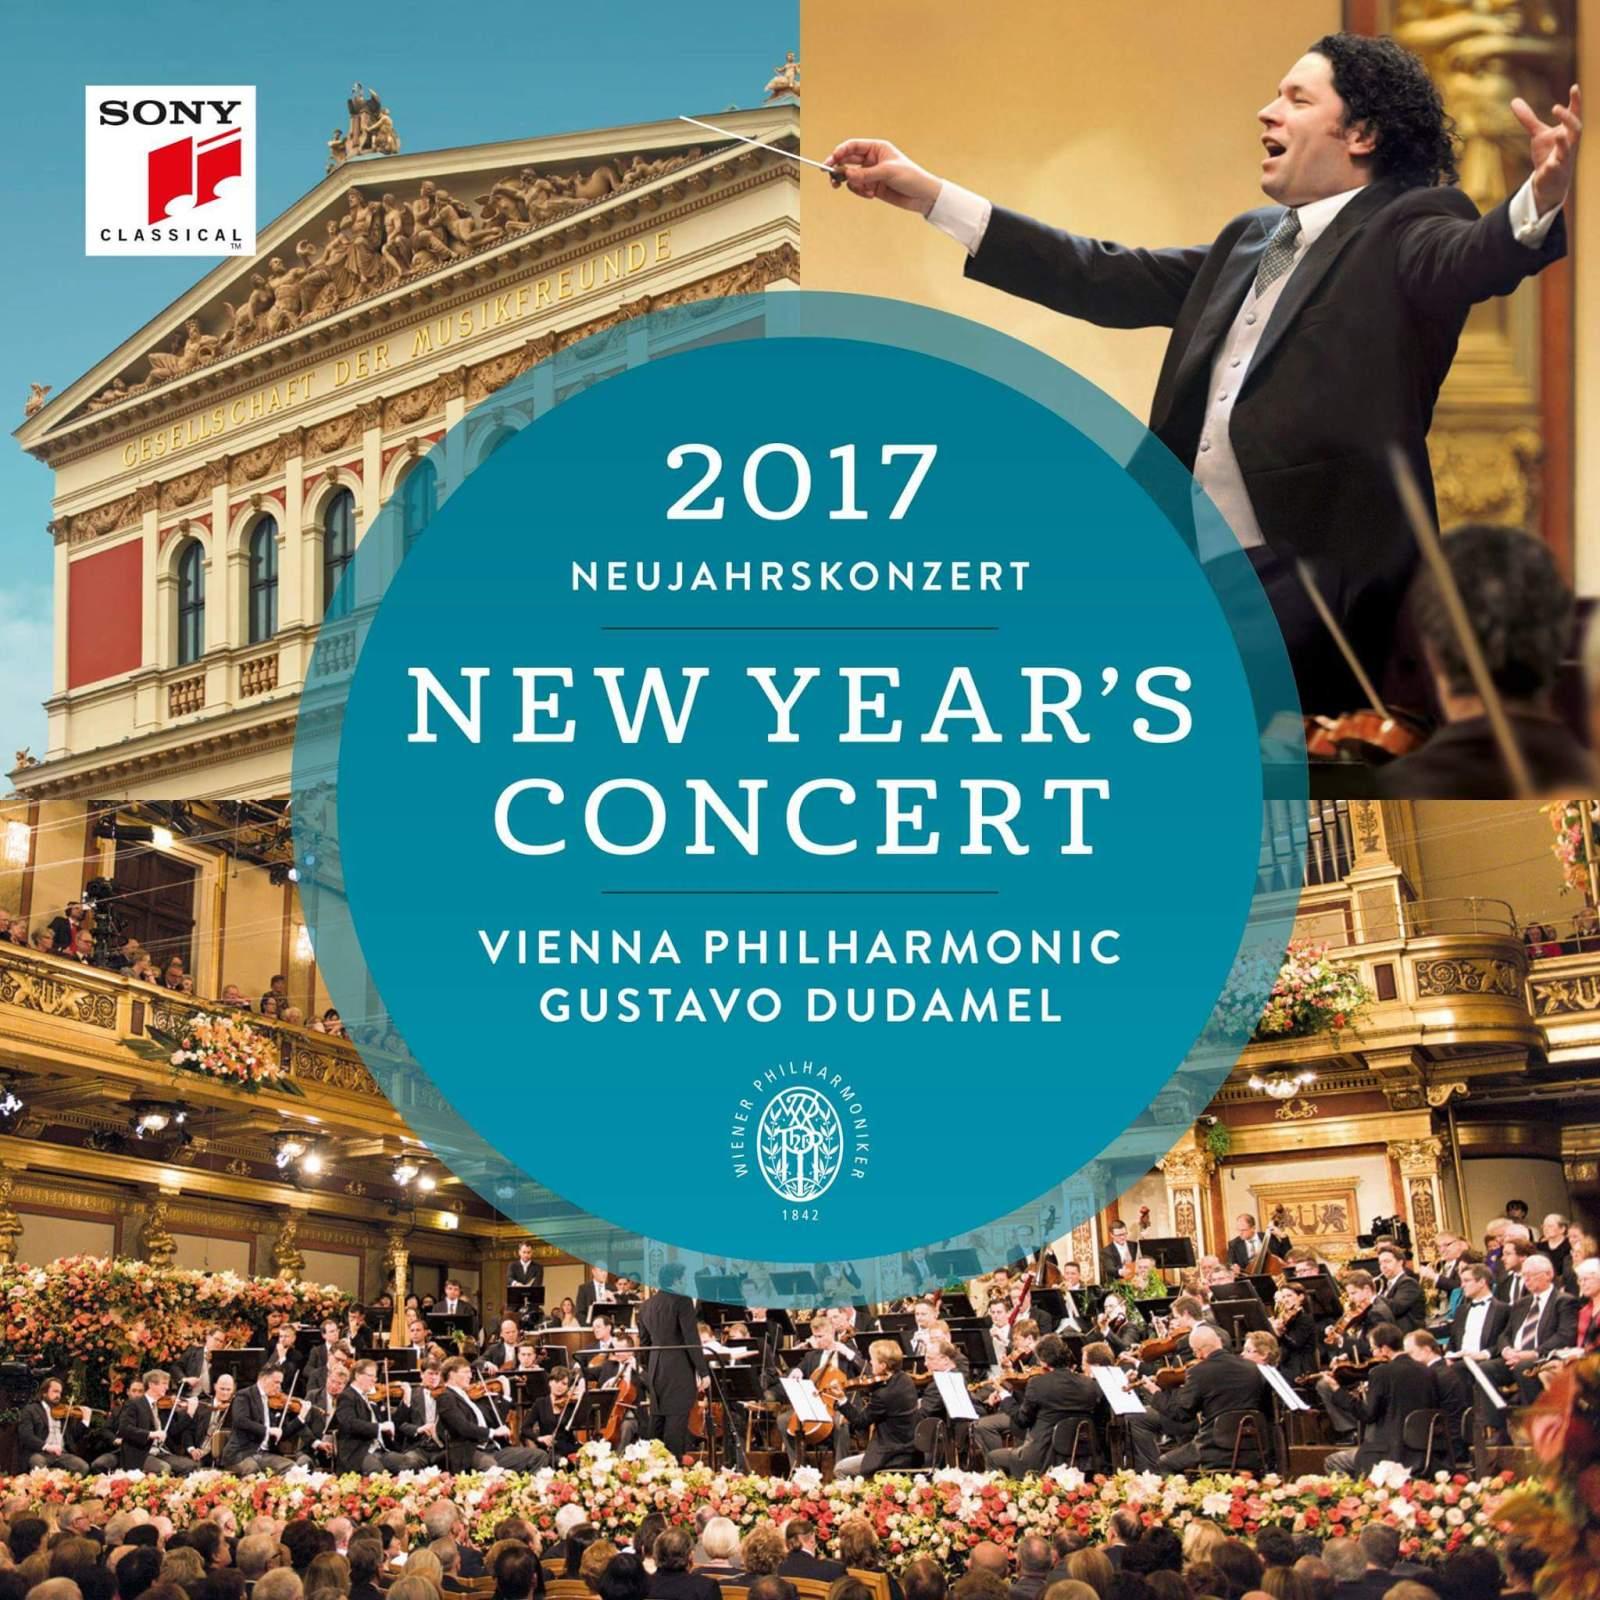 Wiener Philharmoniker Vienna New Year's Concert 2017